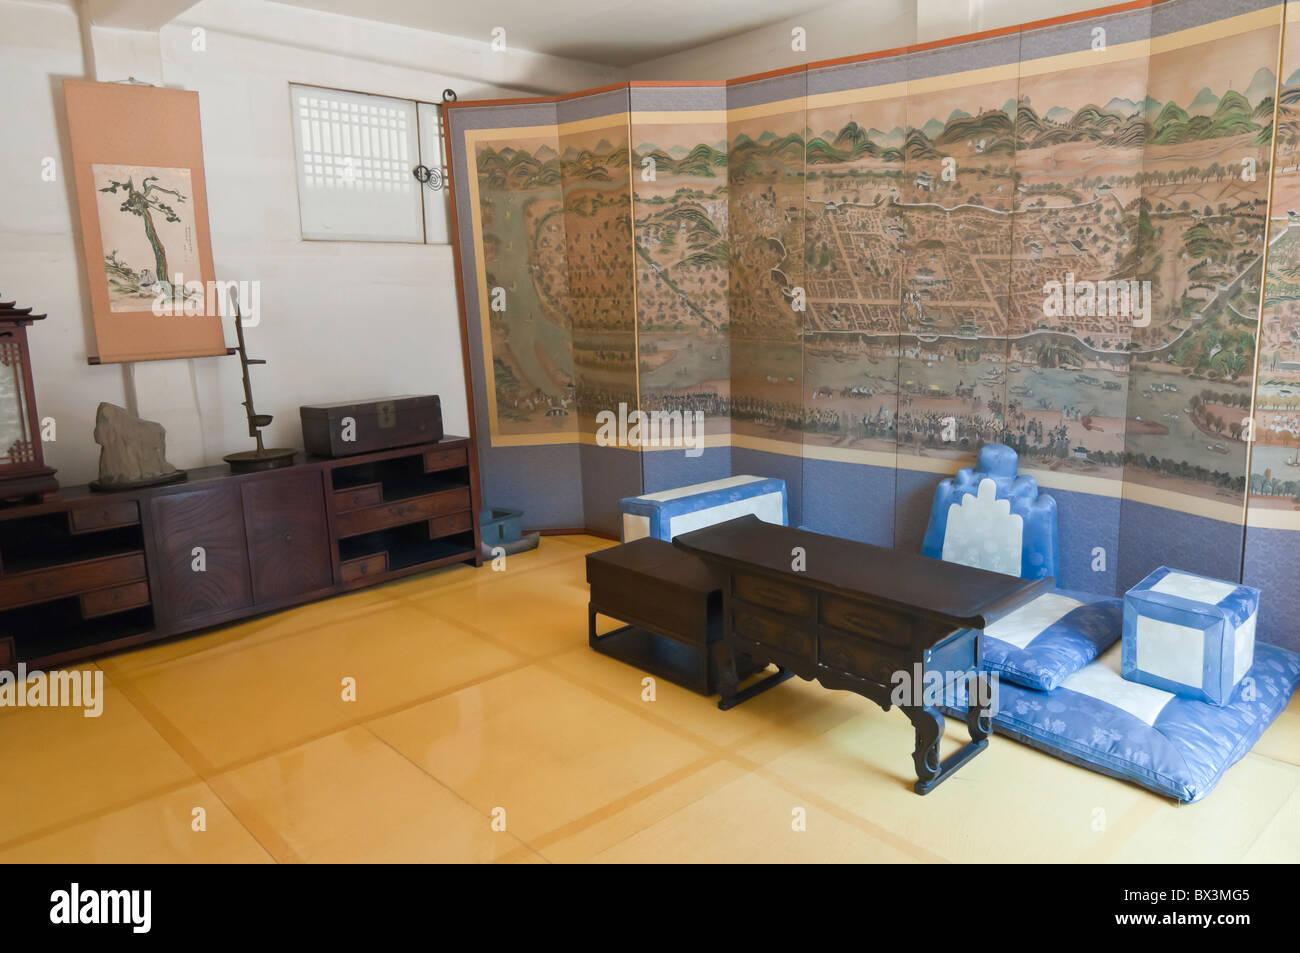 Room inside Sunjeong Hyo Empress Yun's parents home, Namsangol folk village, Seoul, South Korea Stock Photo